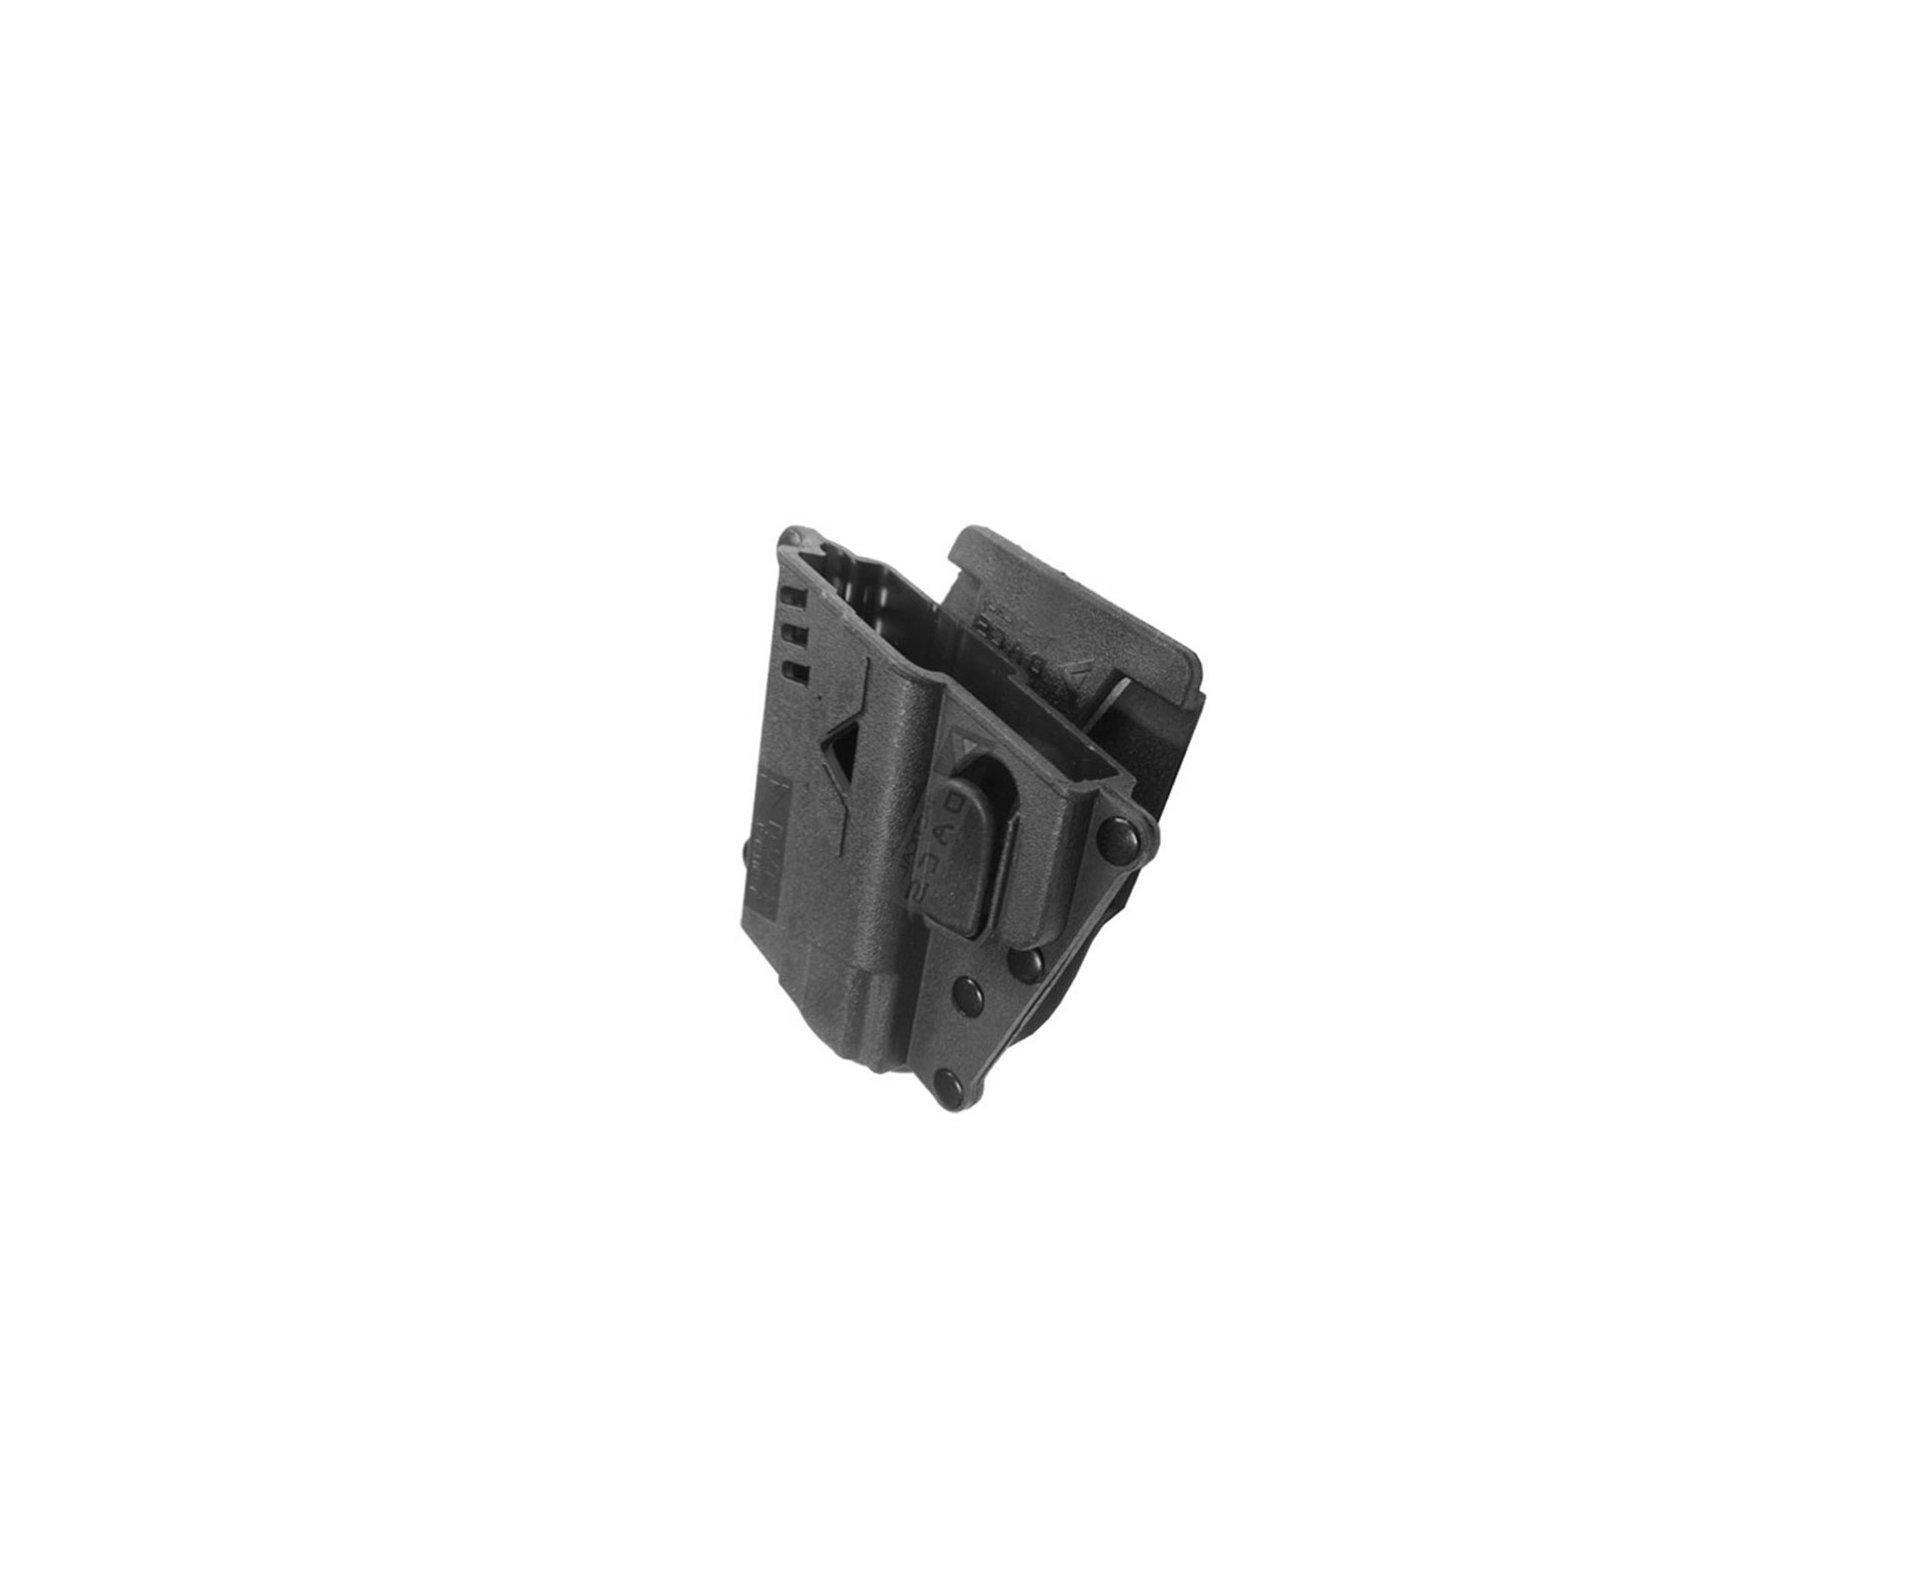 Coldre Em Polimero Universal Taurus - Preto - Canhoto Para Taurus E Glock